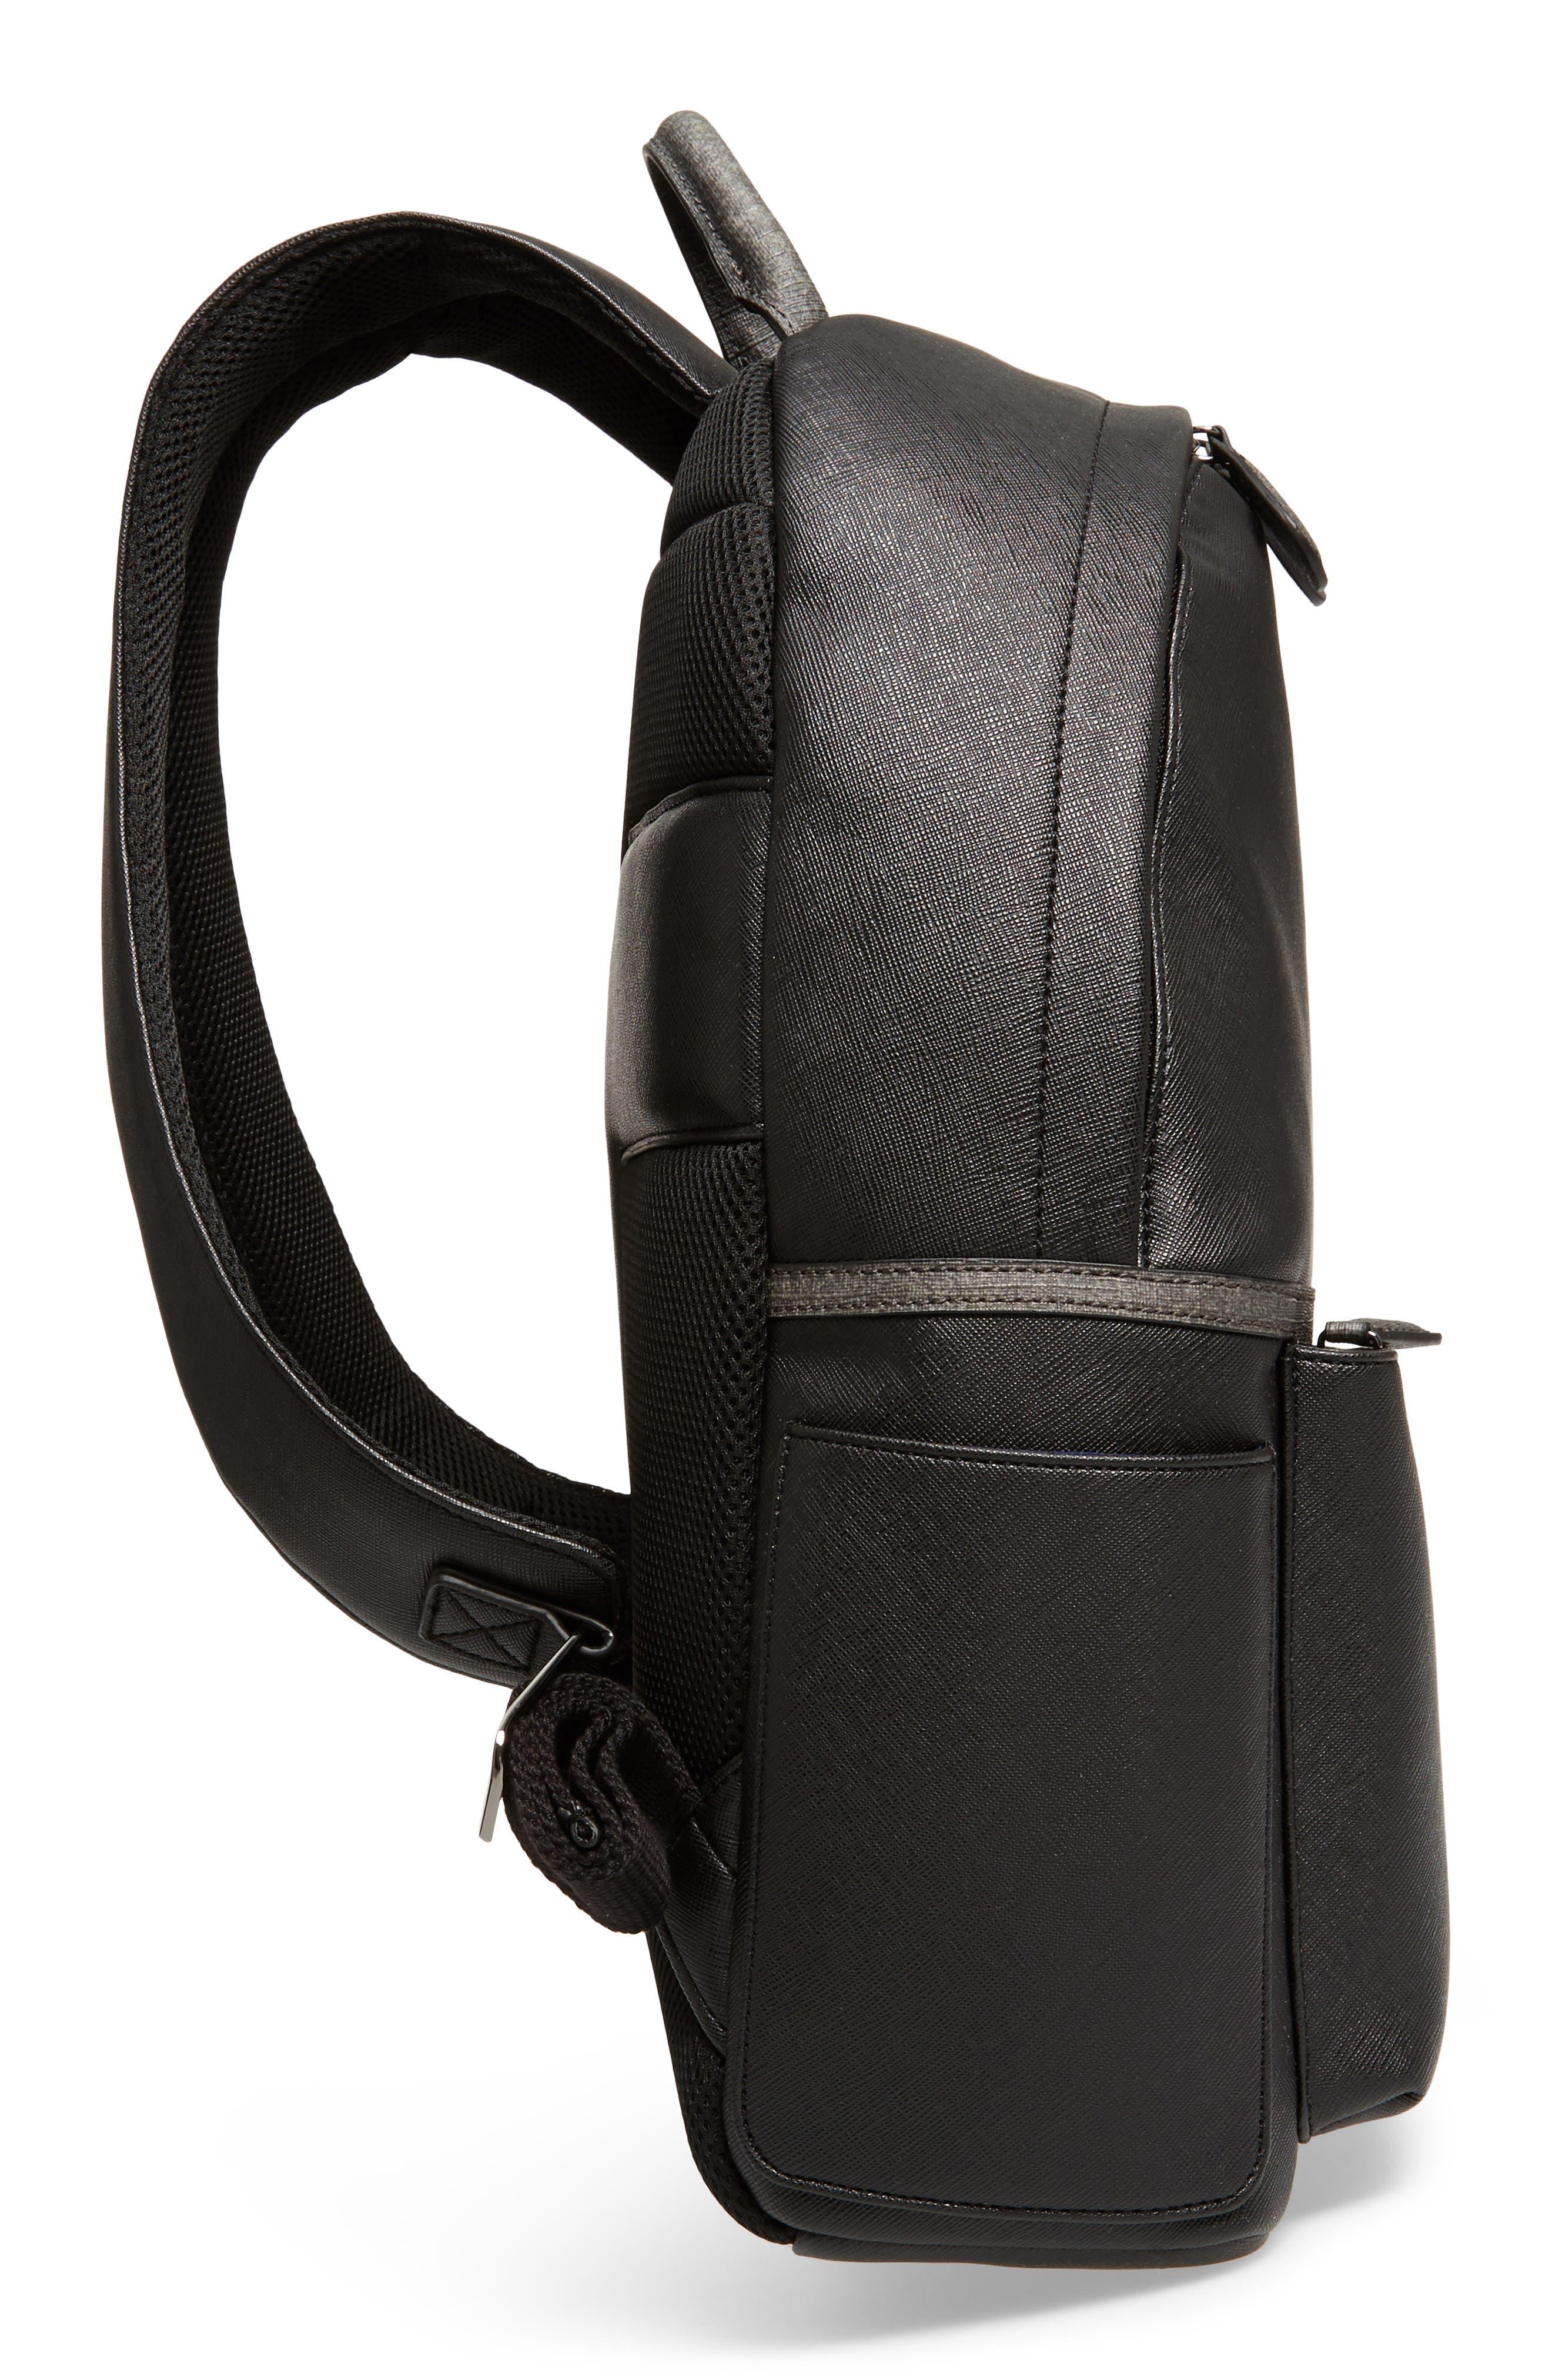 Fangs Backpack,                             Alternate thumbnail 5, color,                             Black